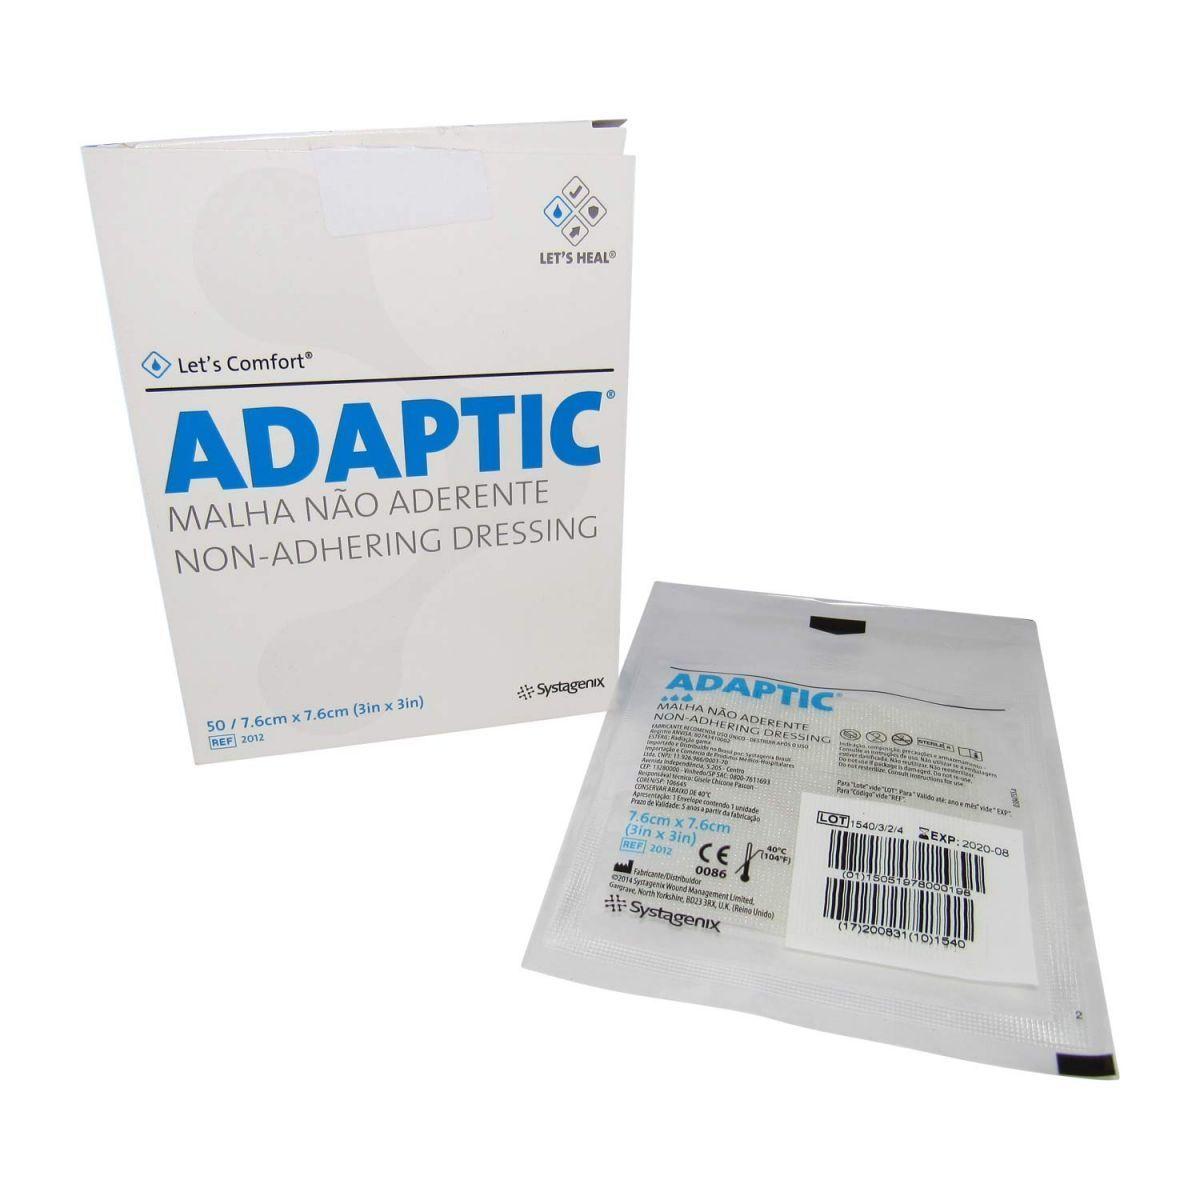 Adaptic 7,6 x 7,6cm Curativo cx com 10 Unidades